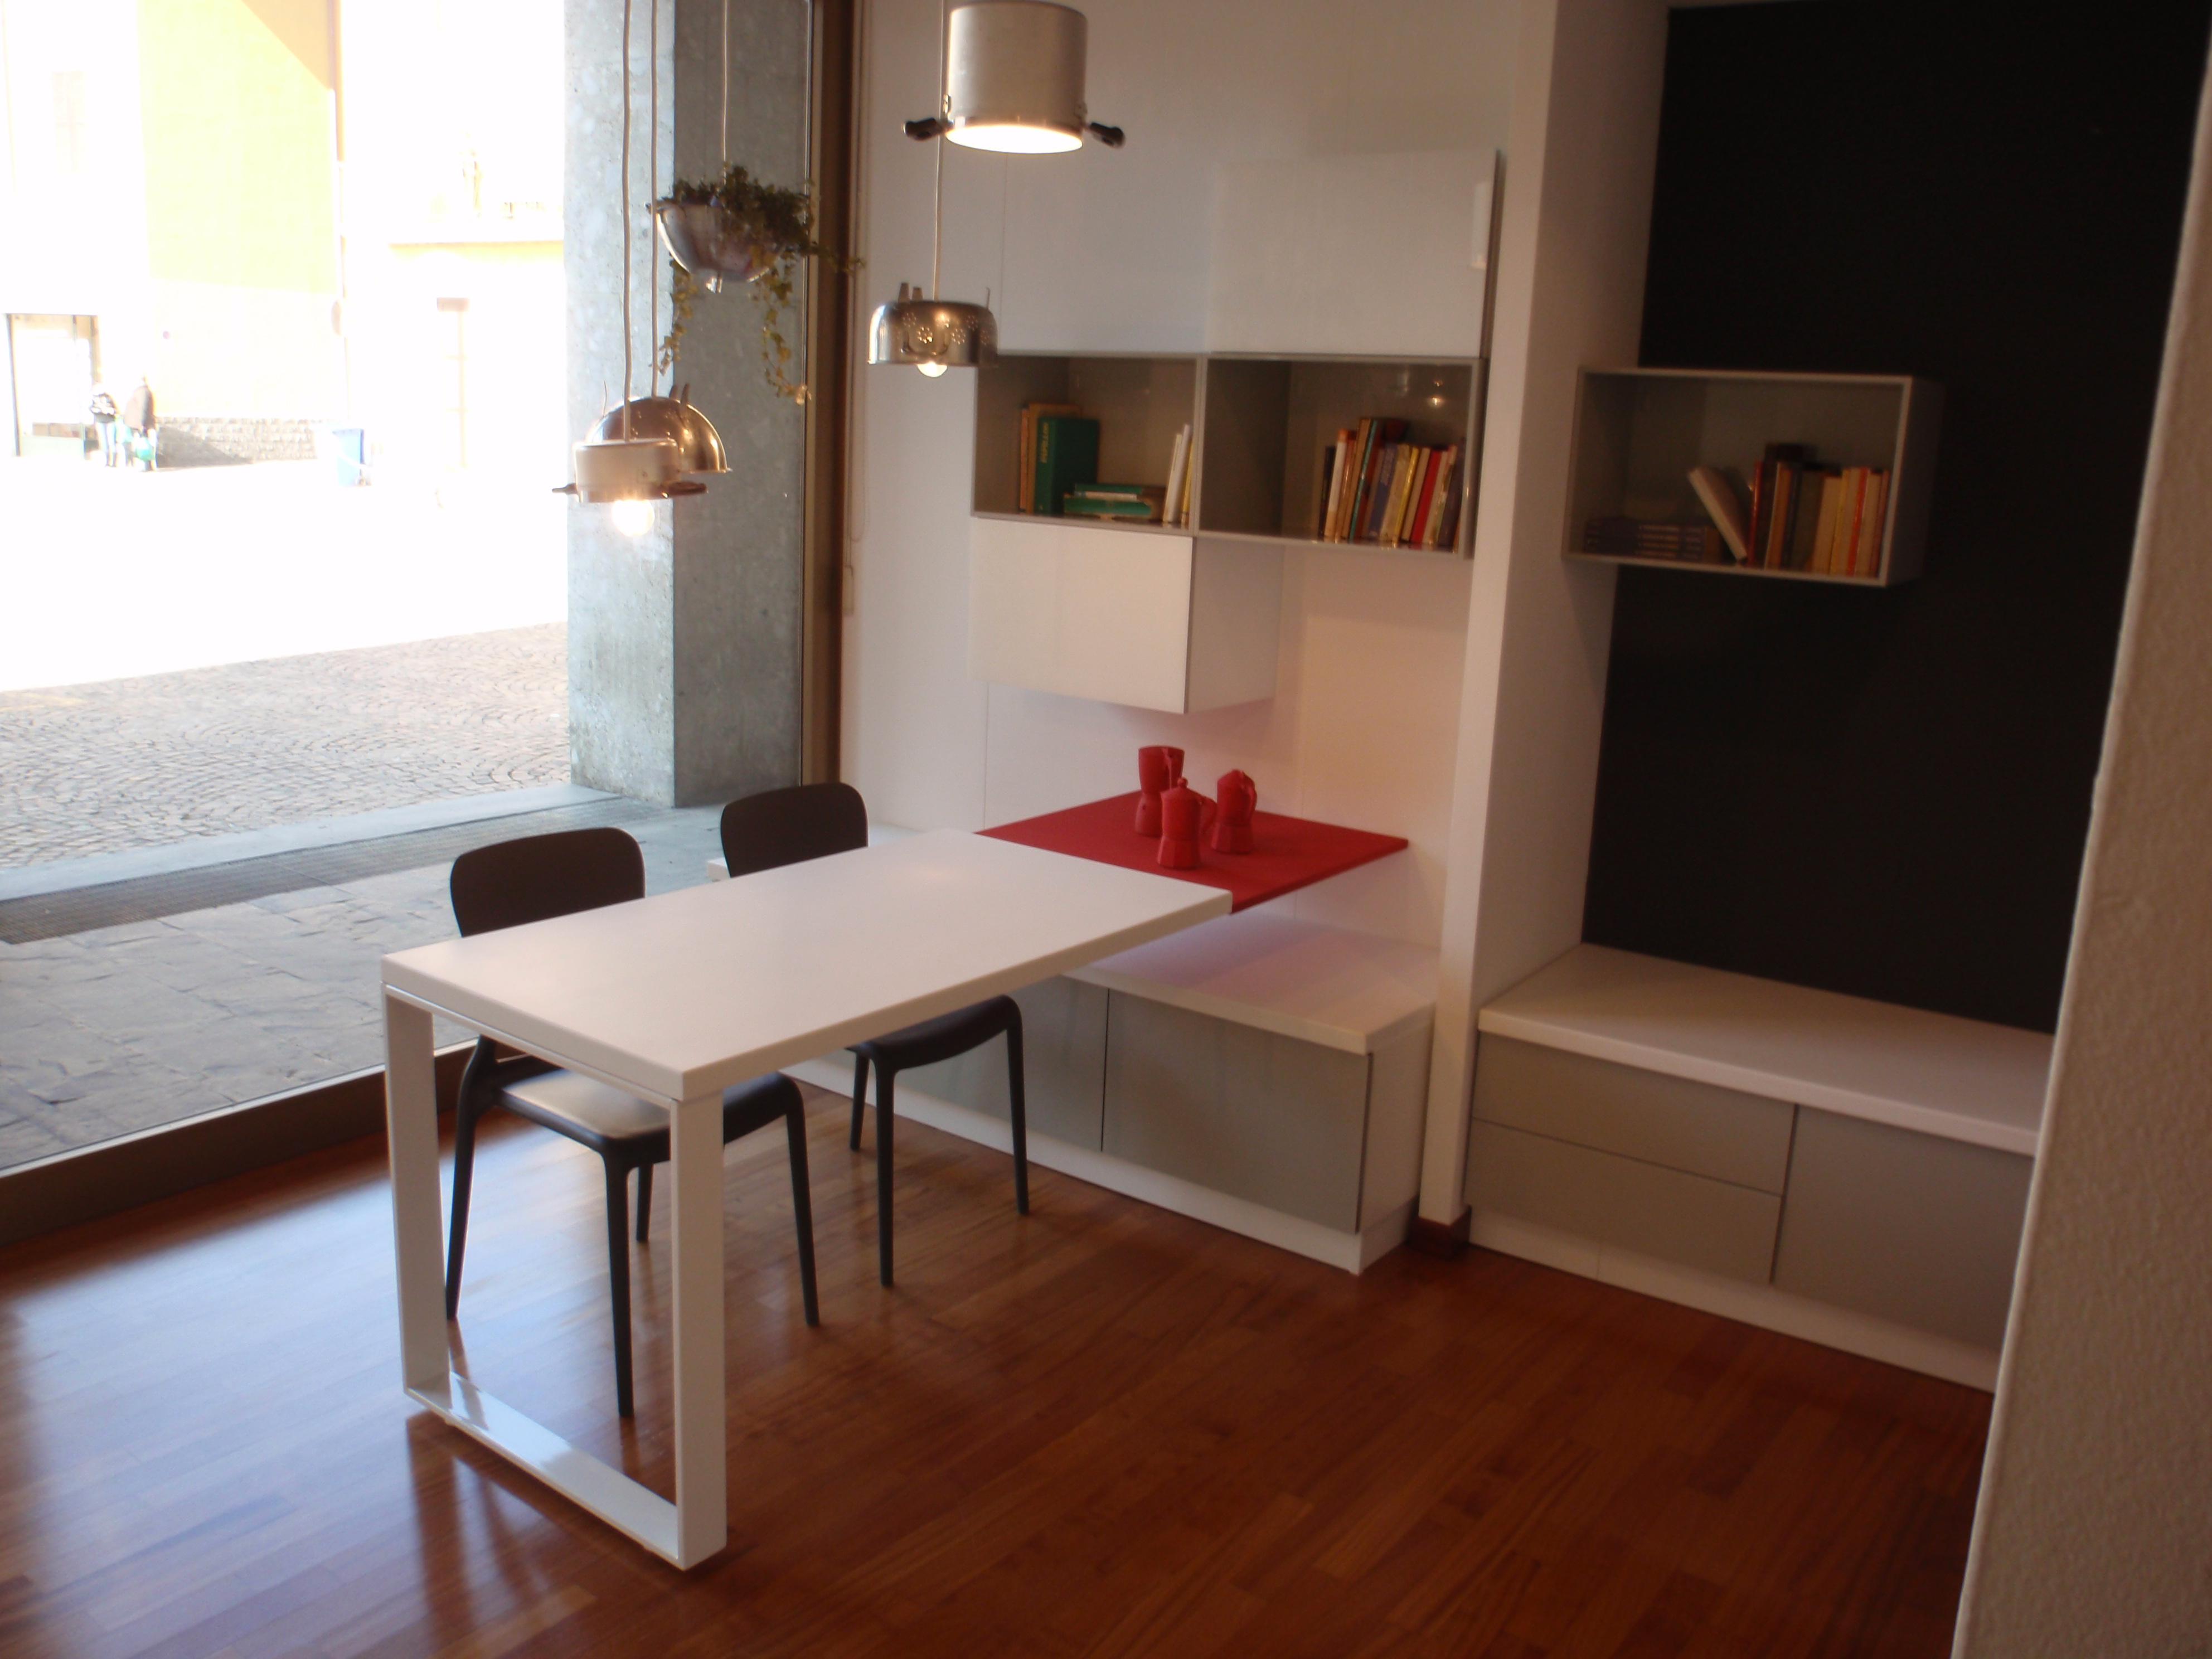 Cucina Scavolini Tetrix Offerta | Top Cucina Ceramica Tetrix ...